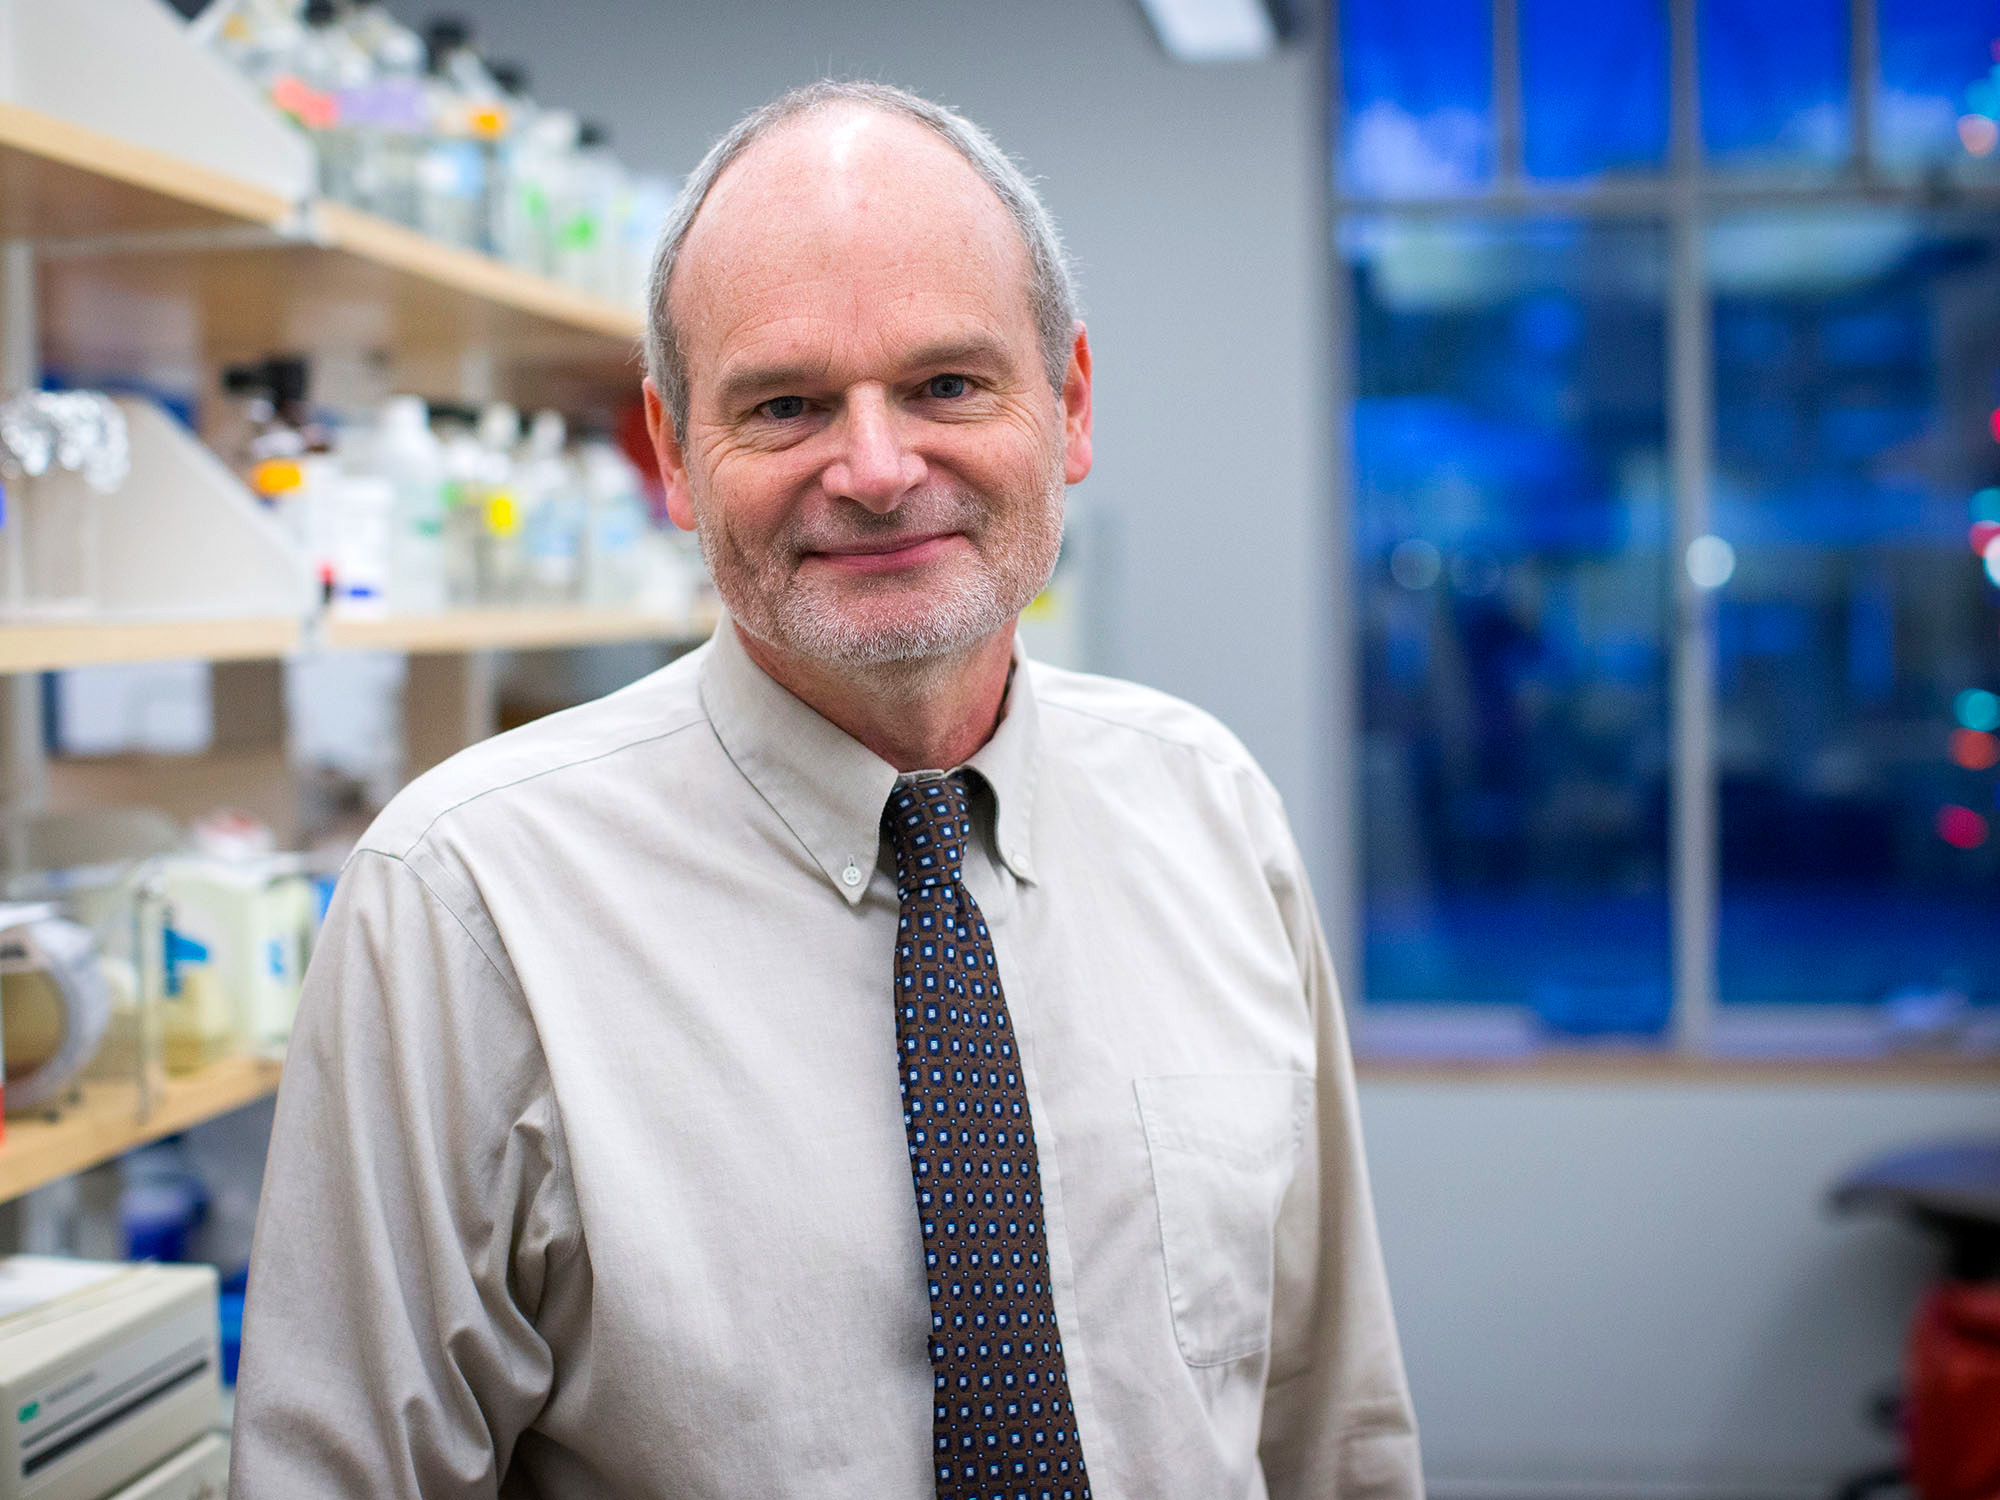 Dr. William A. Petri (Photo by Sanjay Suchak, University Communications)